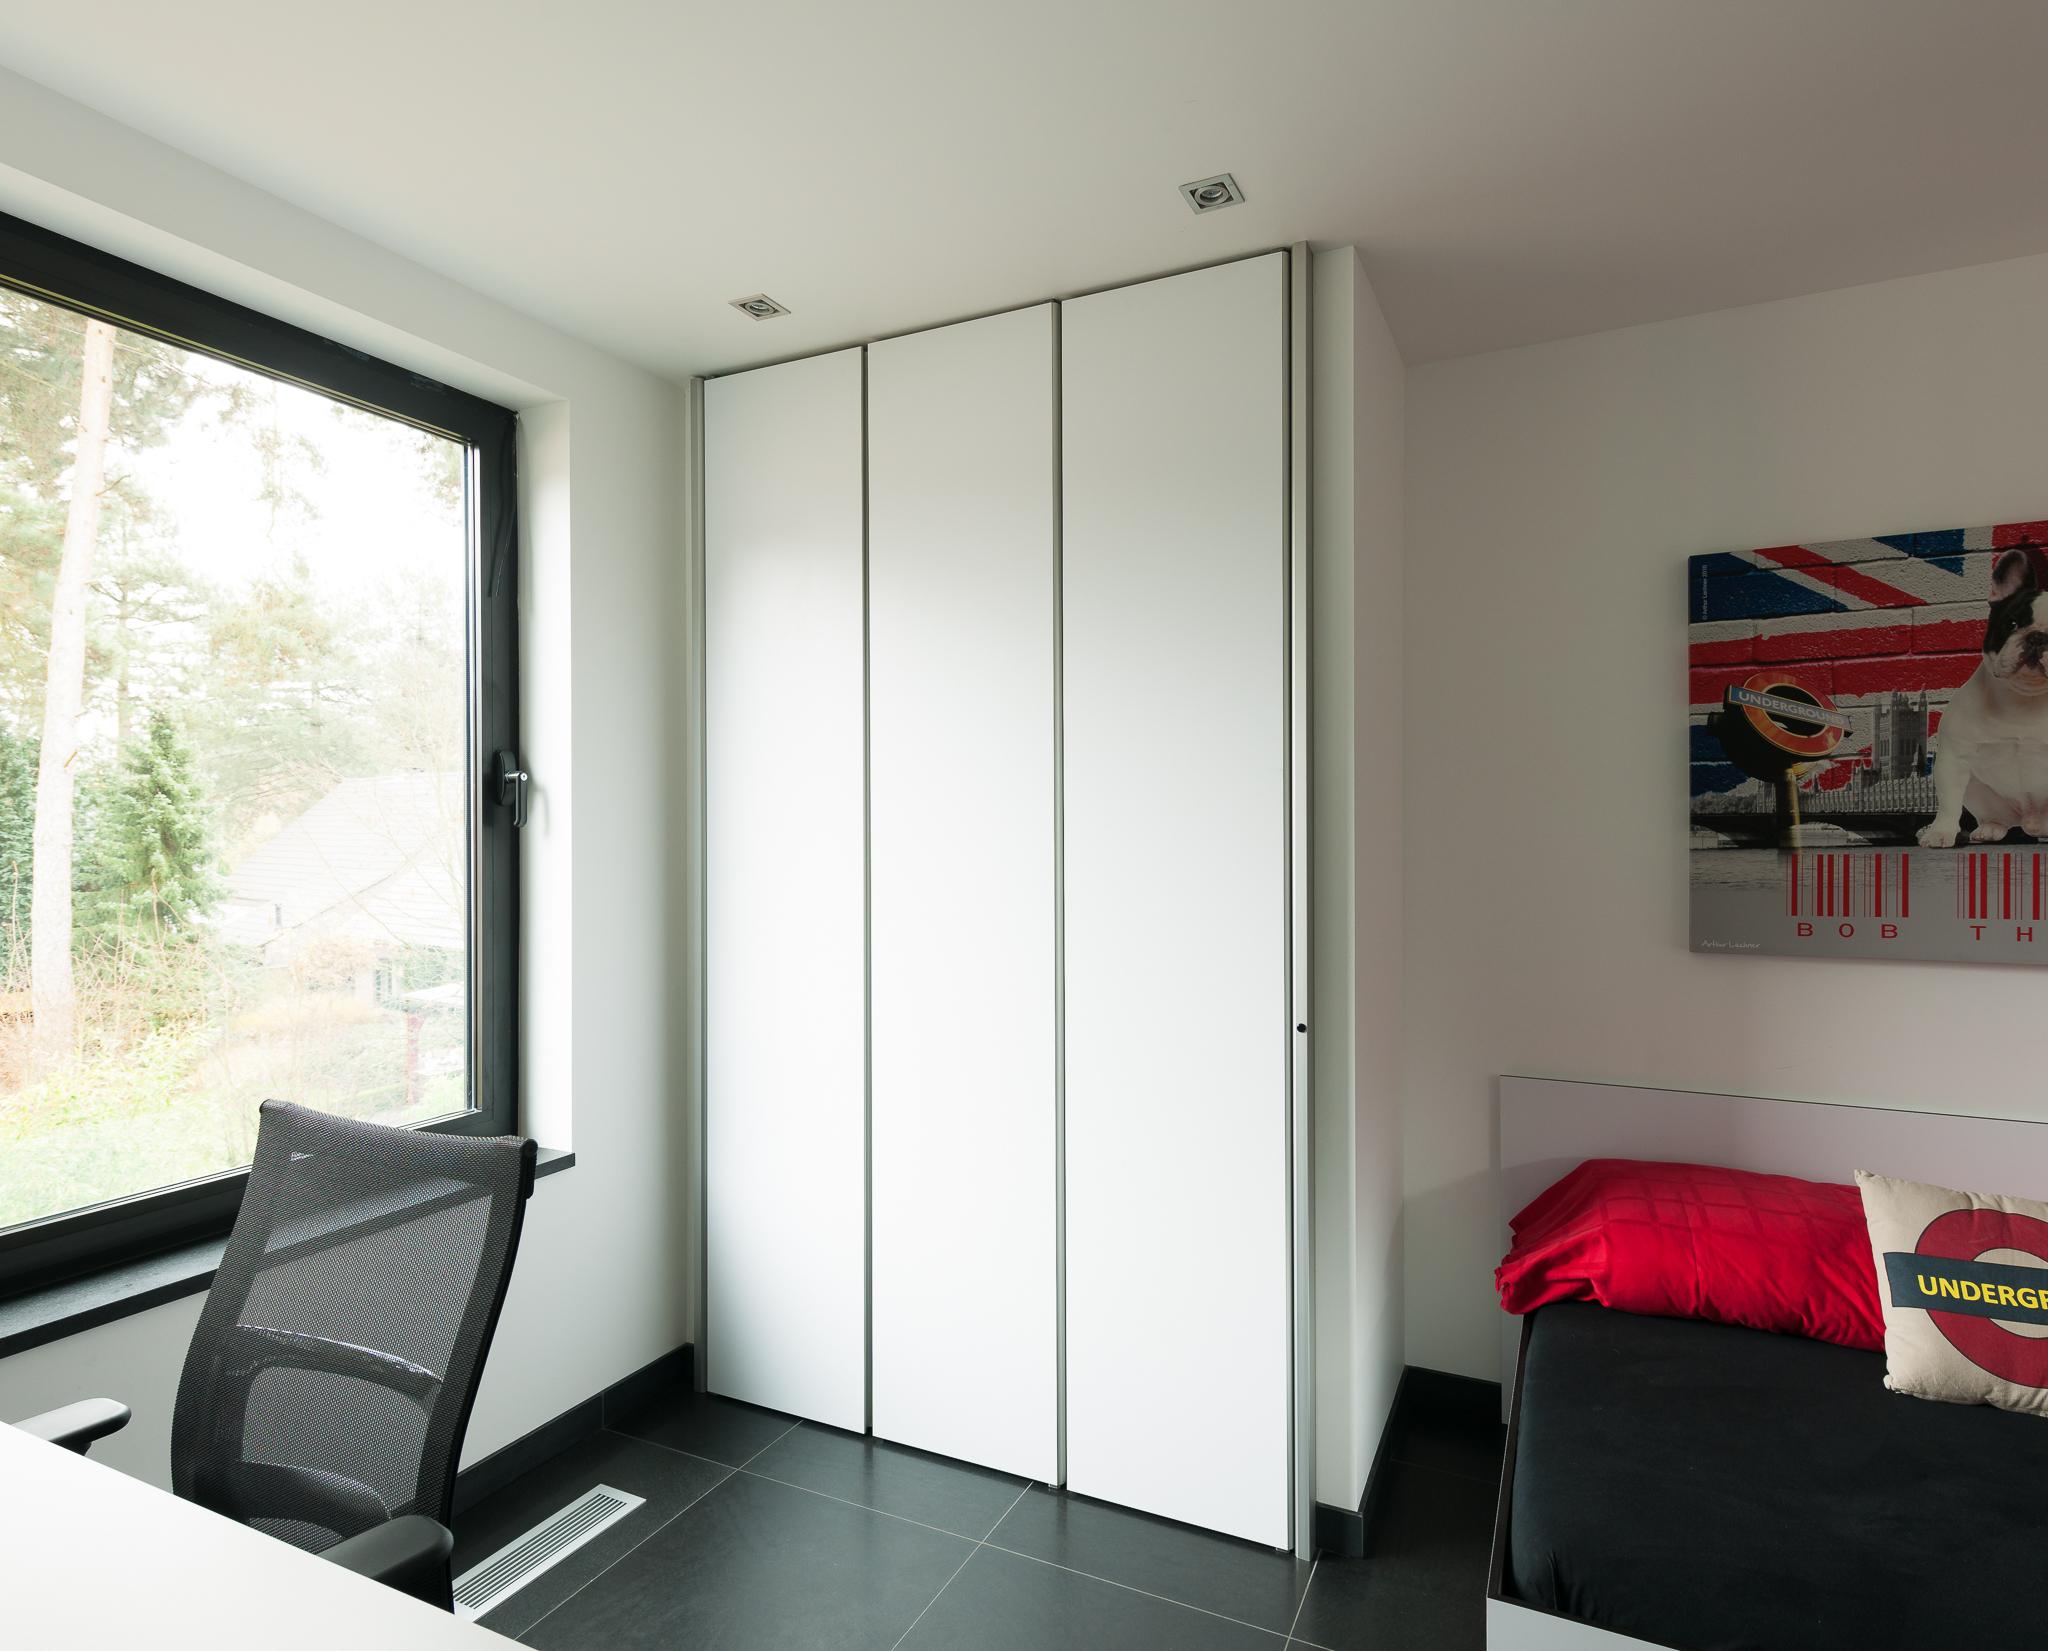 Slaapkamer in witte - Kamer deco stijl ...